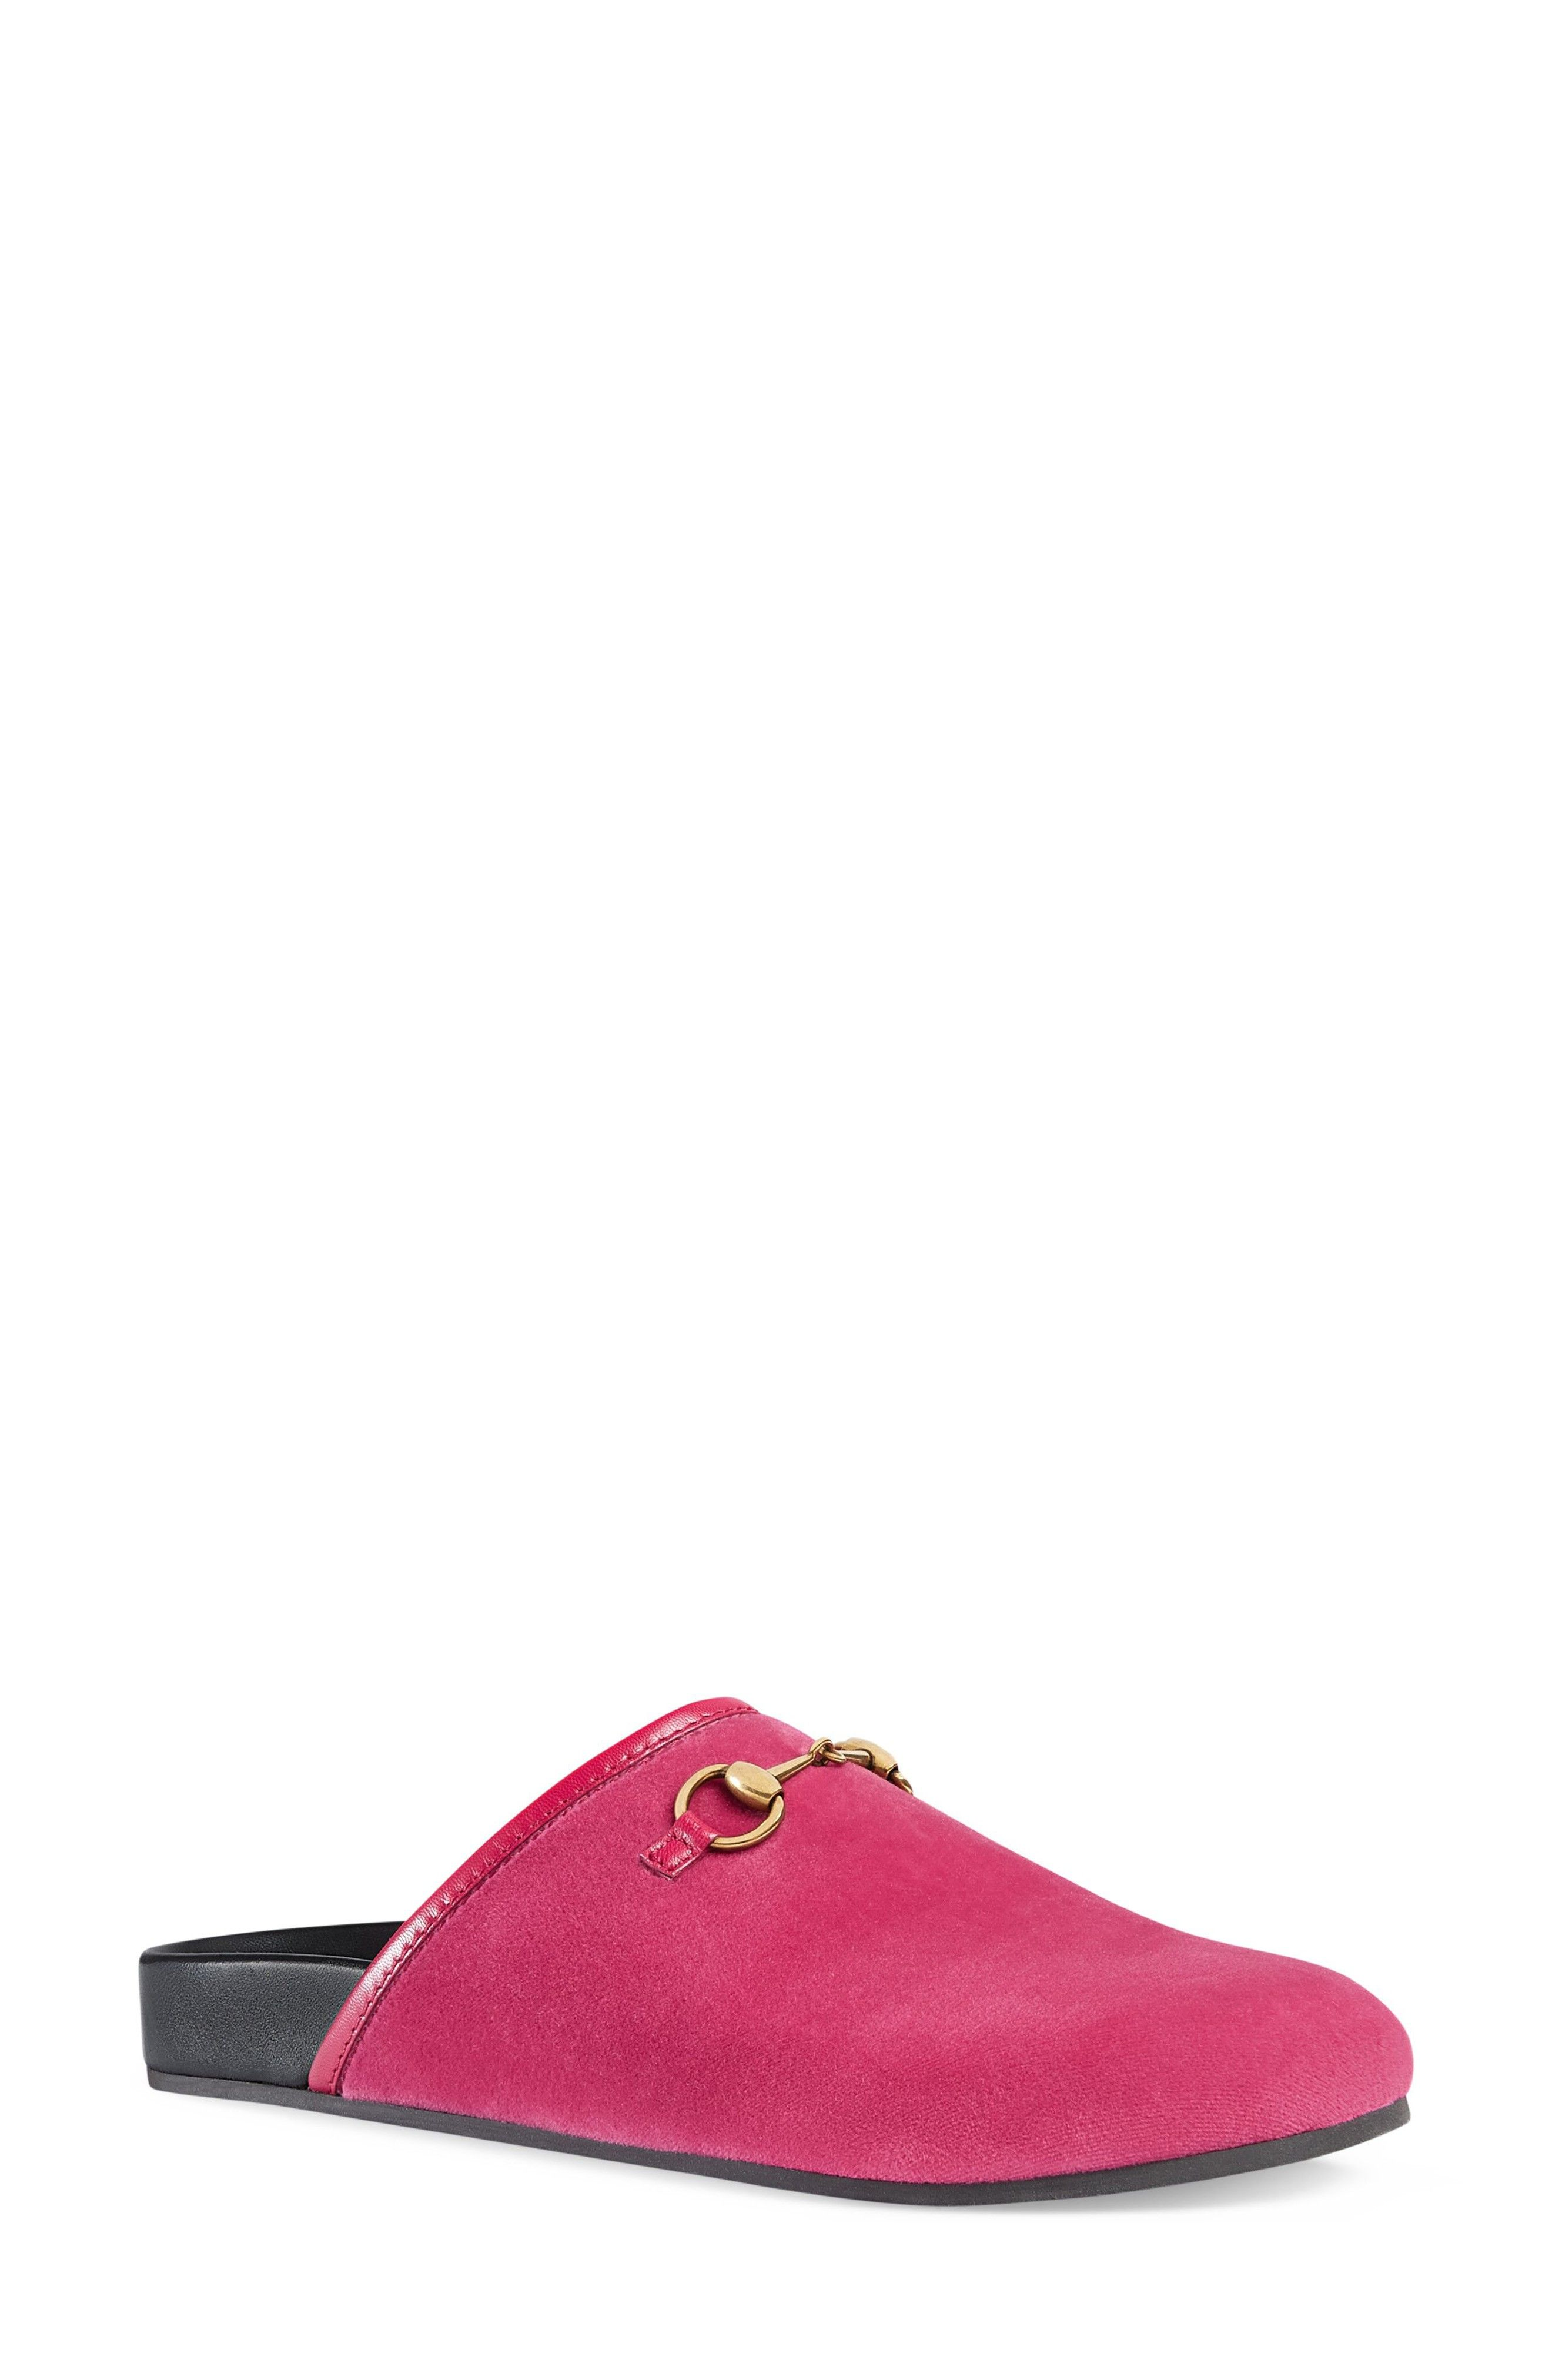 b14c4641cd7 Buy GUCCI New River Mule online. New GUCCI Flats.   660  SKU  CMVT59981OFUG17781